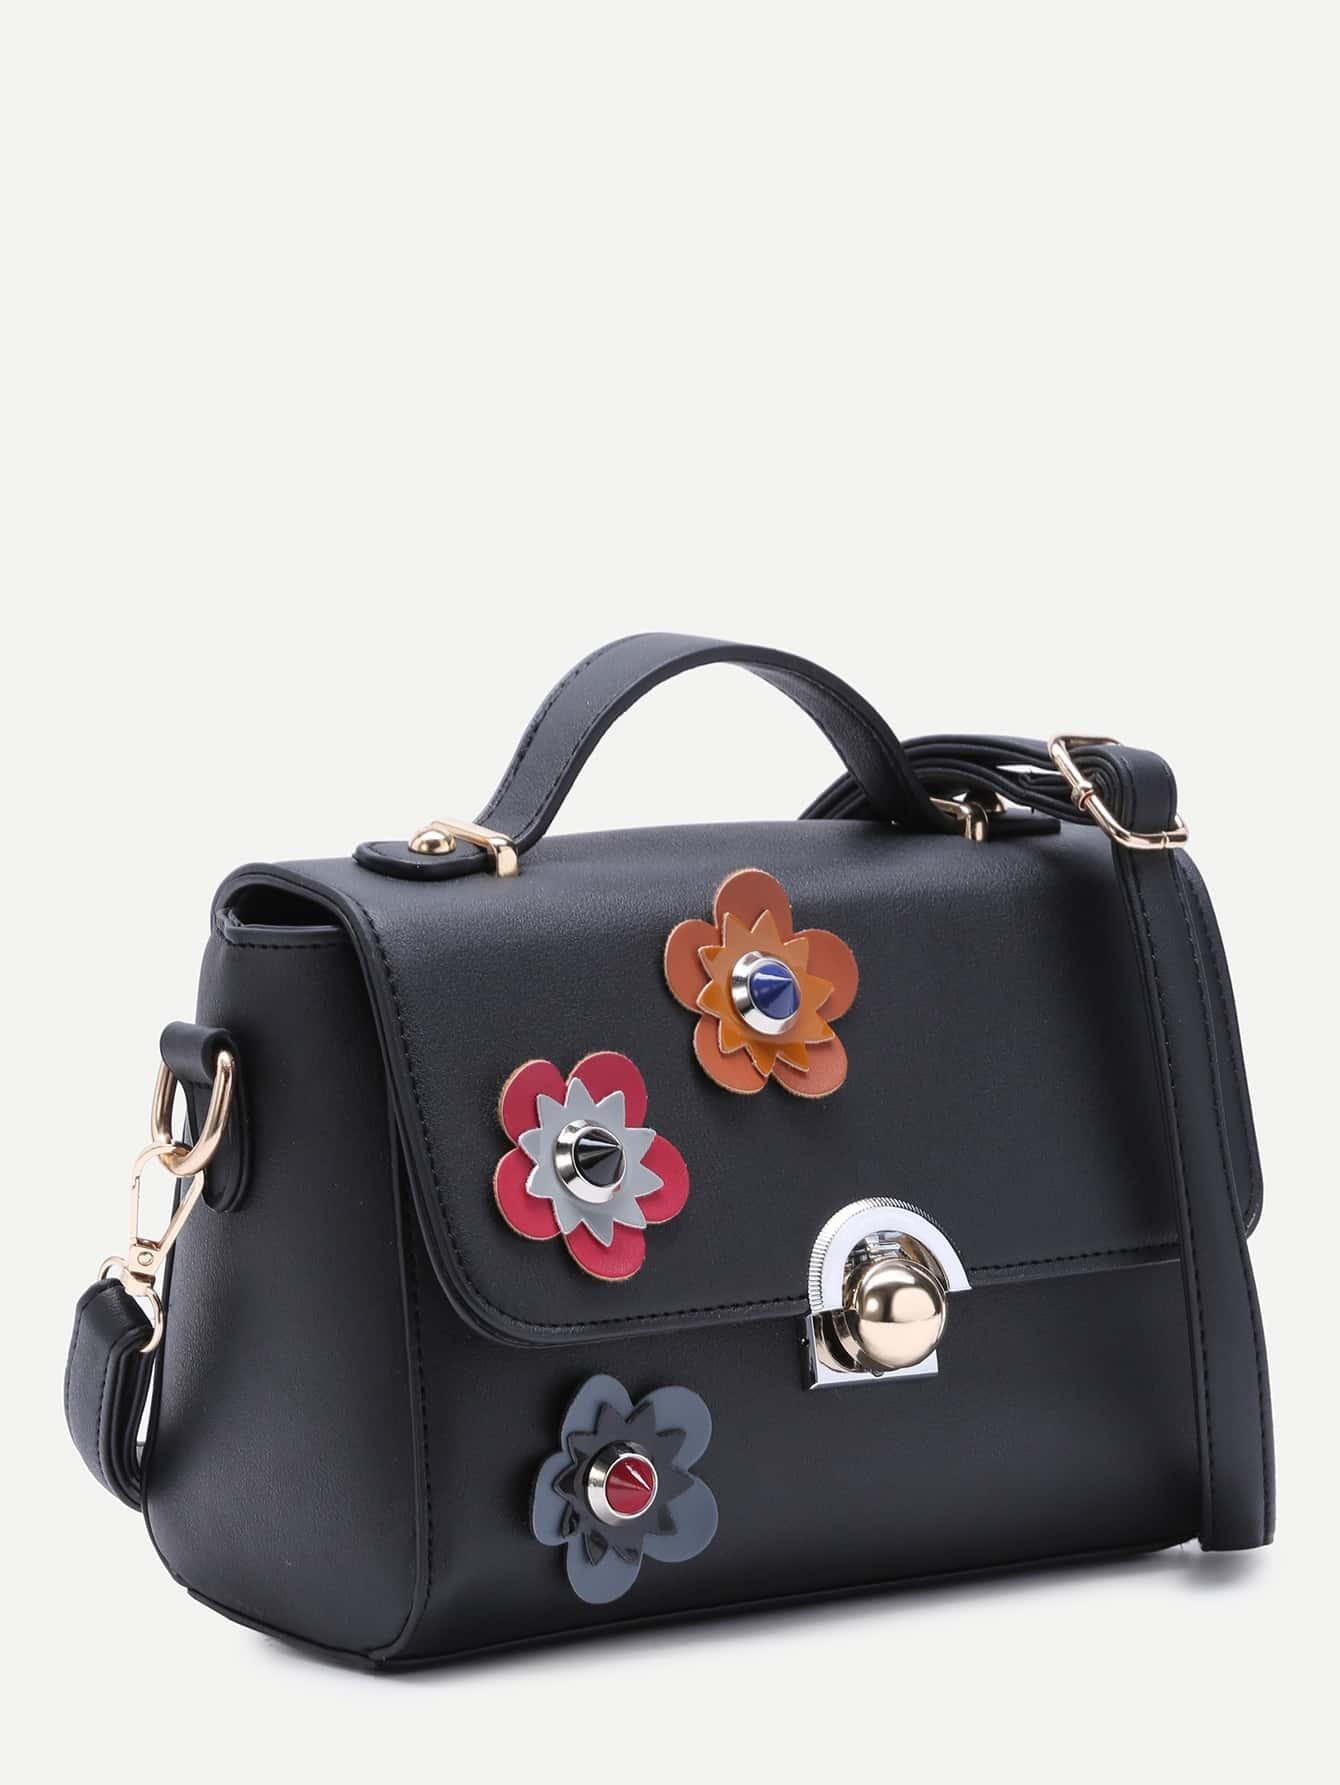 Floral Patch Black PU Crossbody Bag -SheIn(Sheinside)